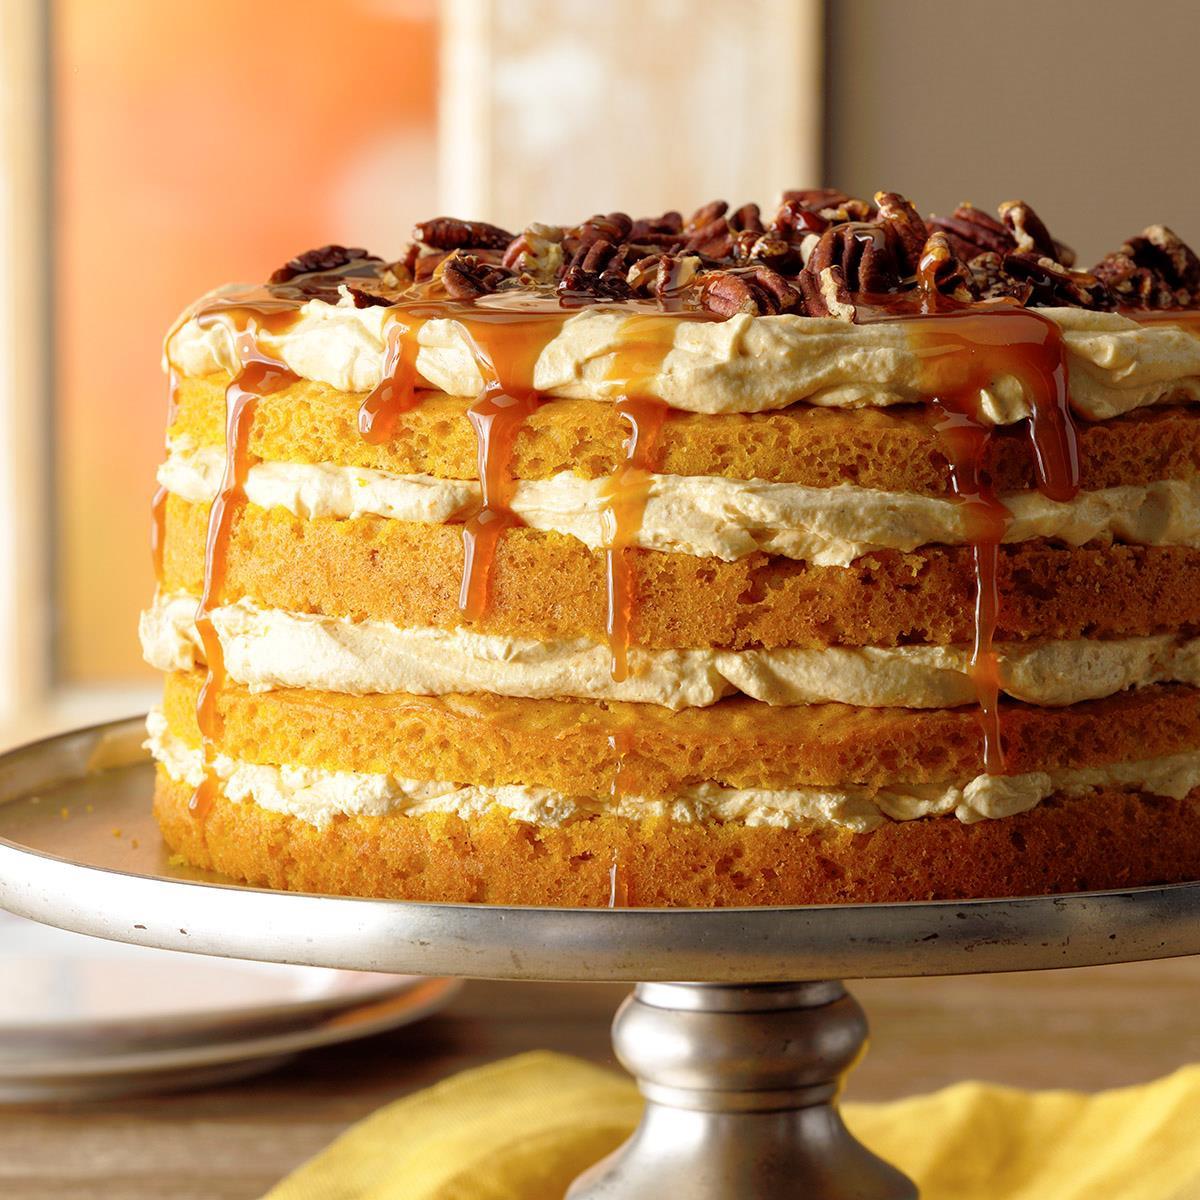 Thanksgiving Pumpkin Recipes  Impressive Thanksgiving Desserts You Gotta Try This Year